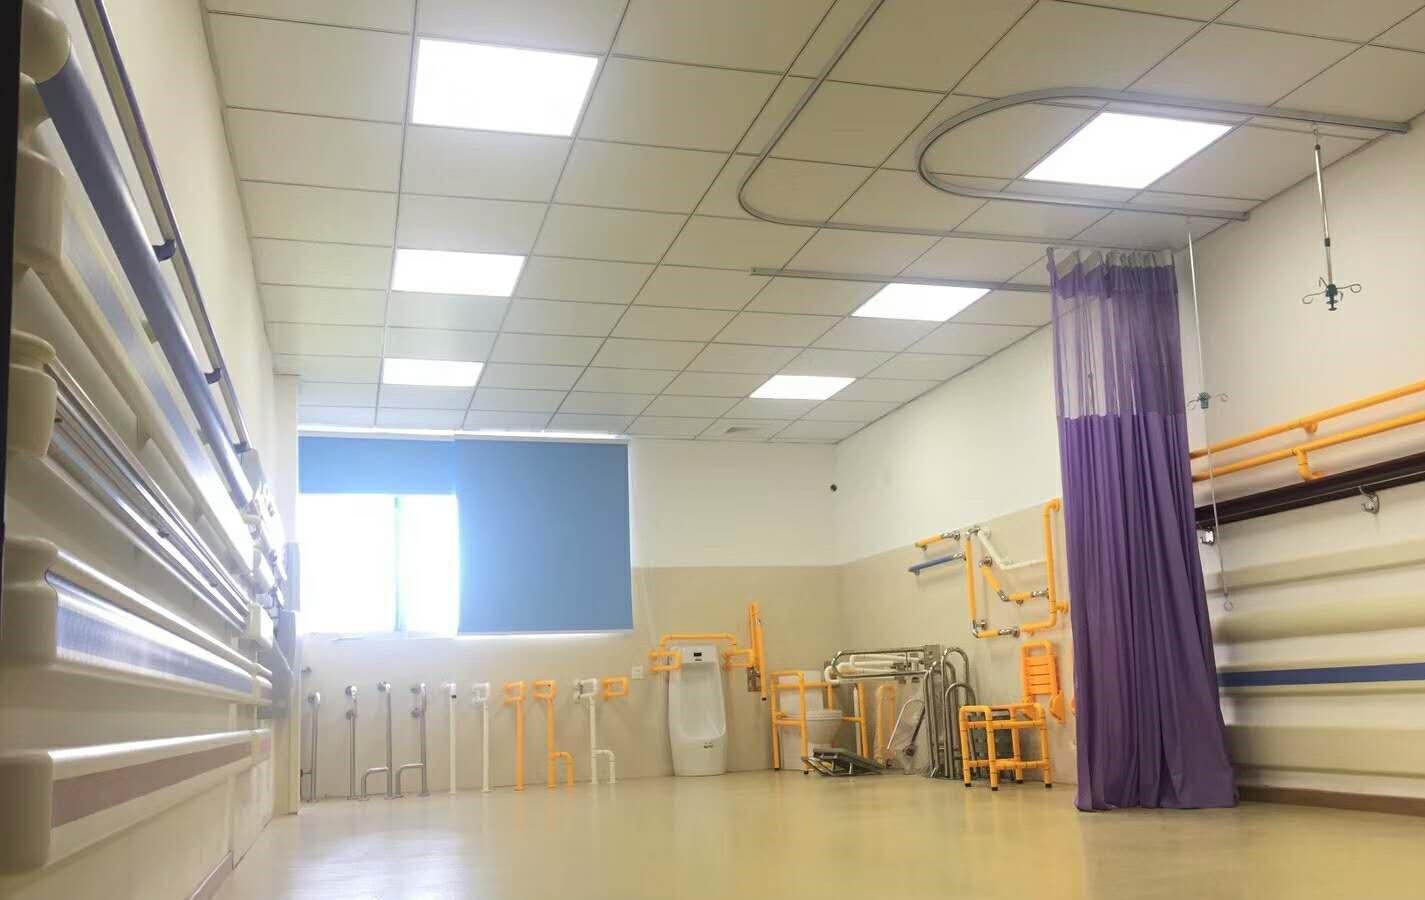 Hospital Antibacterial Handrail